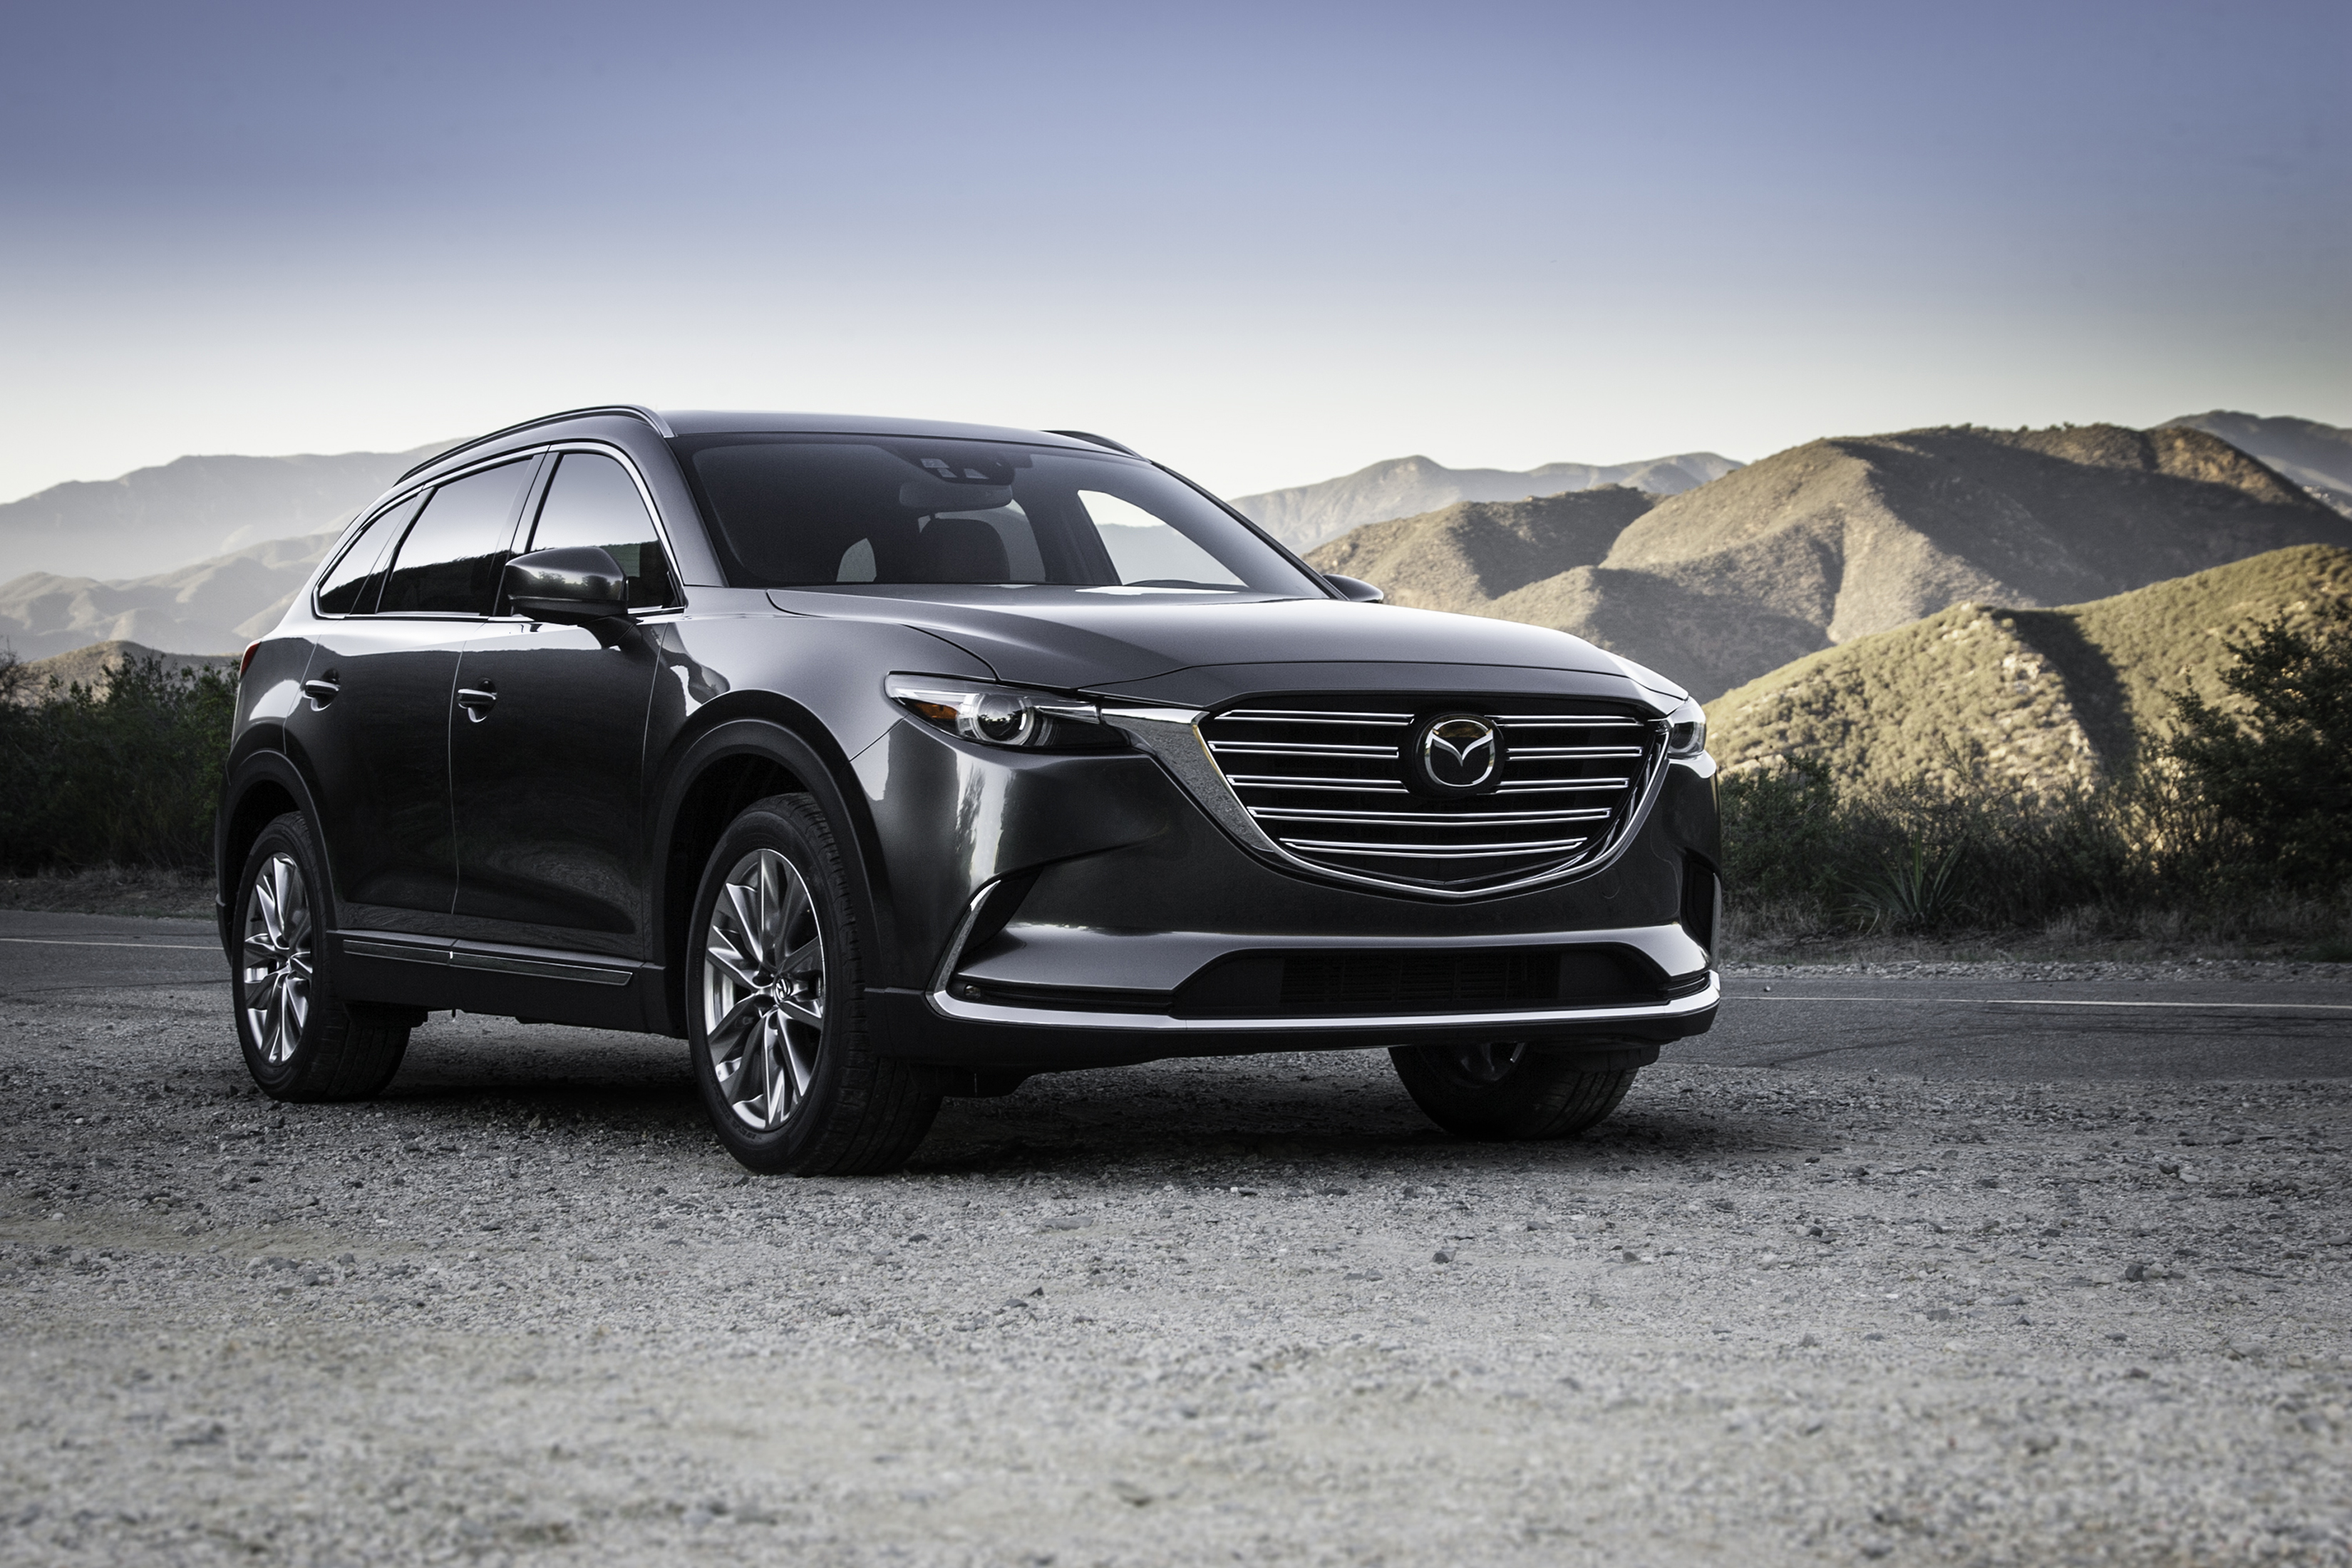 Kekurangan Mazda Cx 7 2017 Spesifikasi